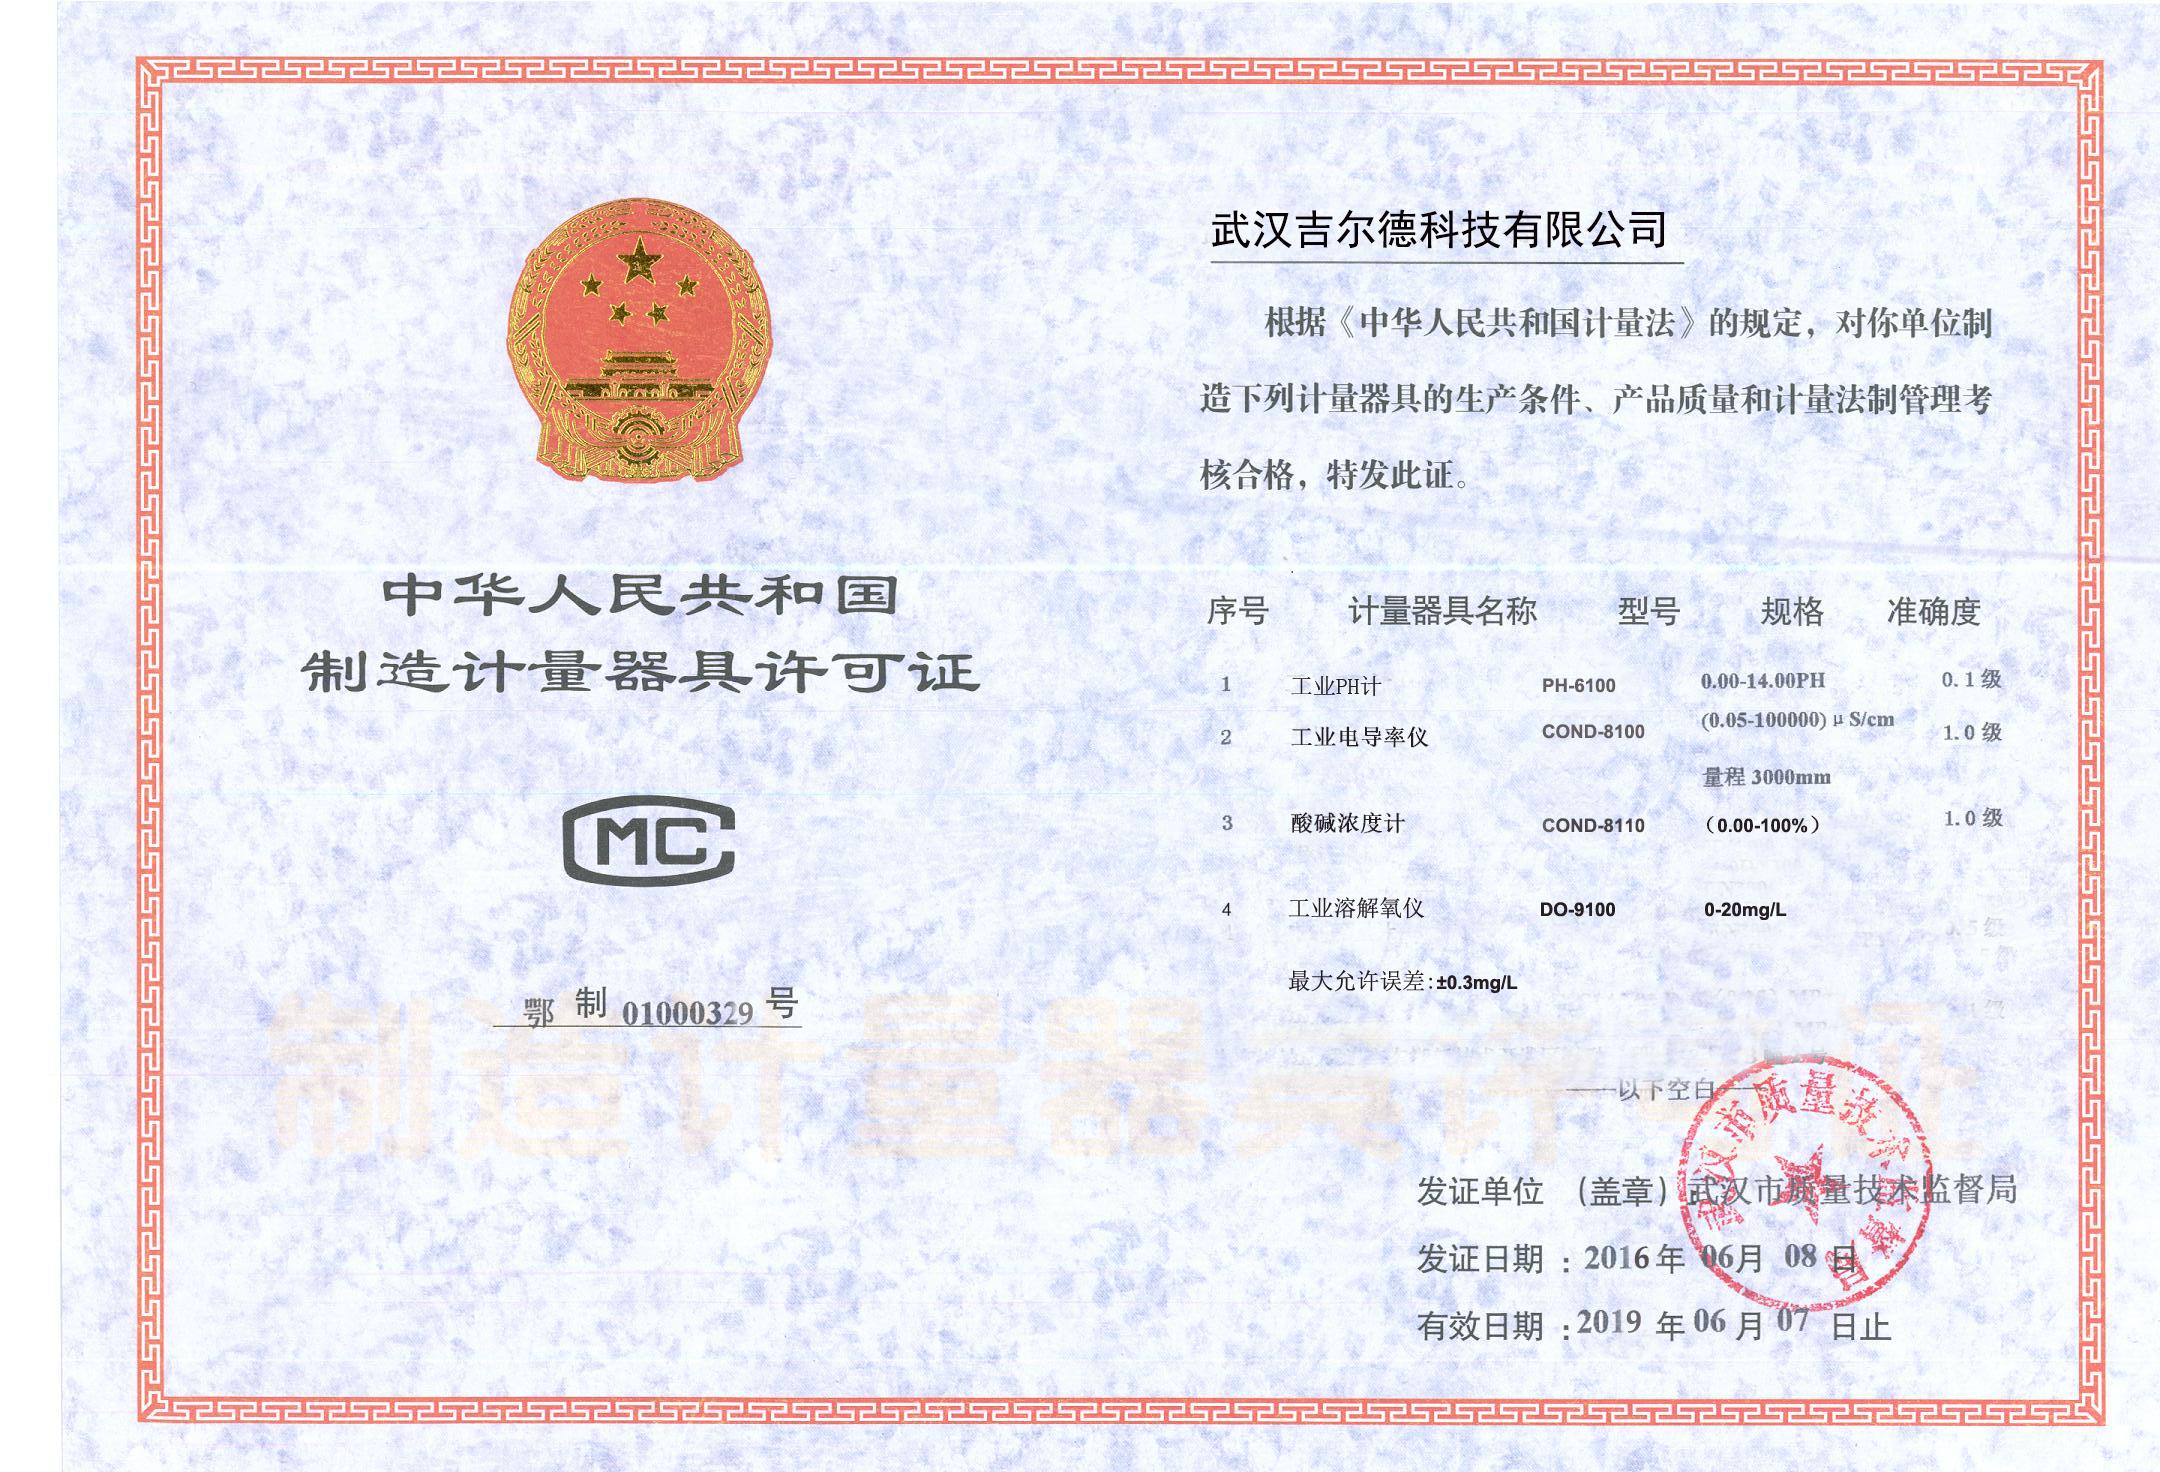 ph計生產許可證